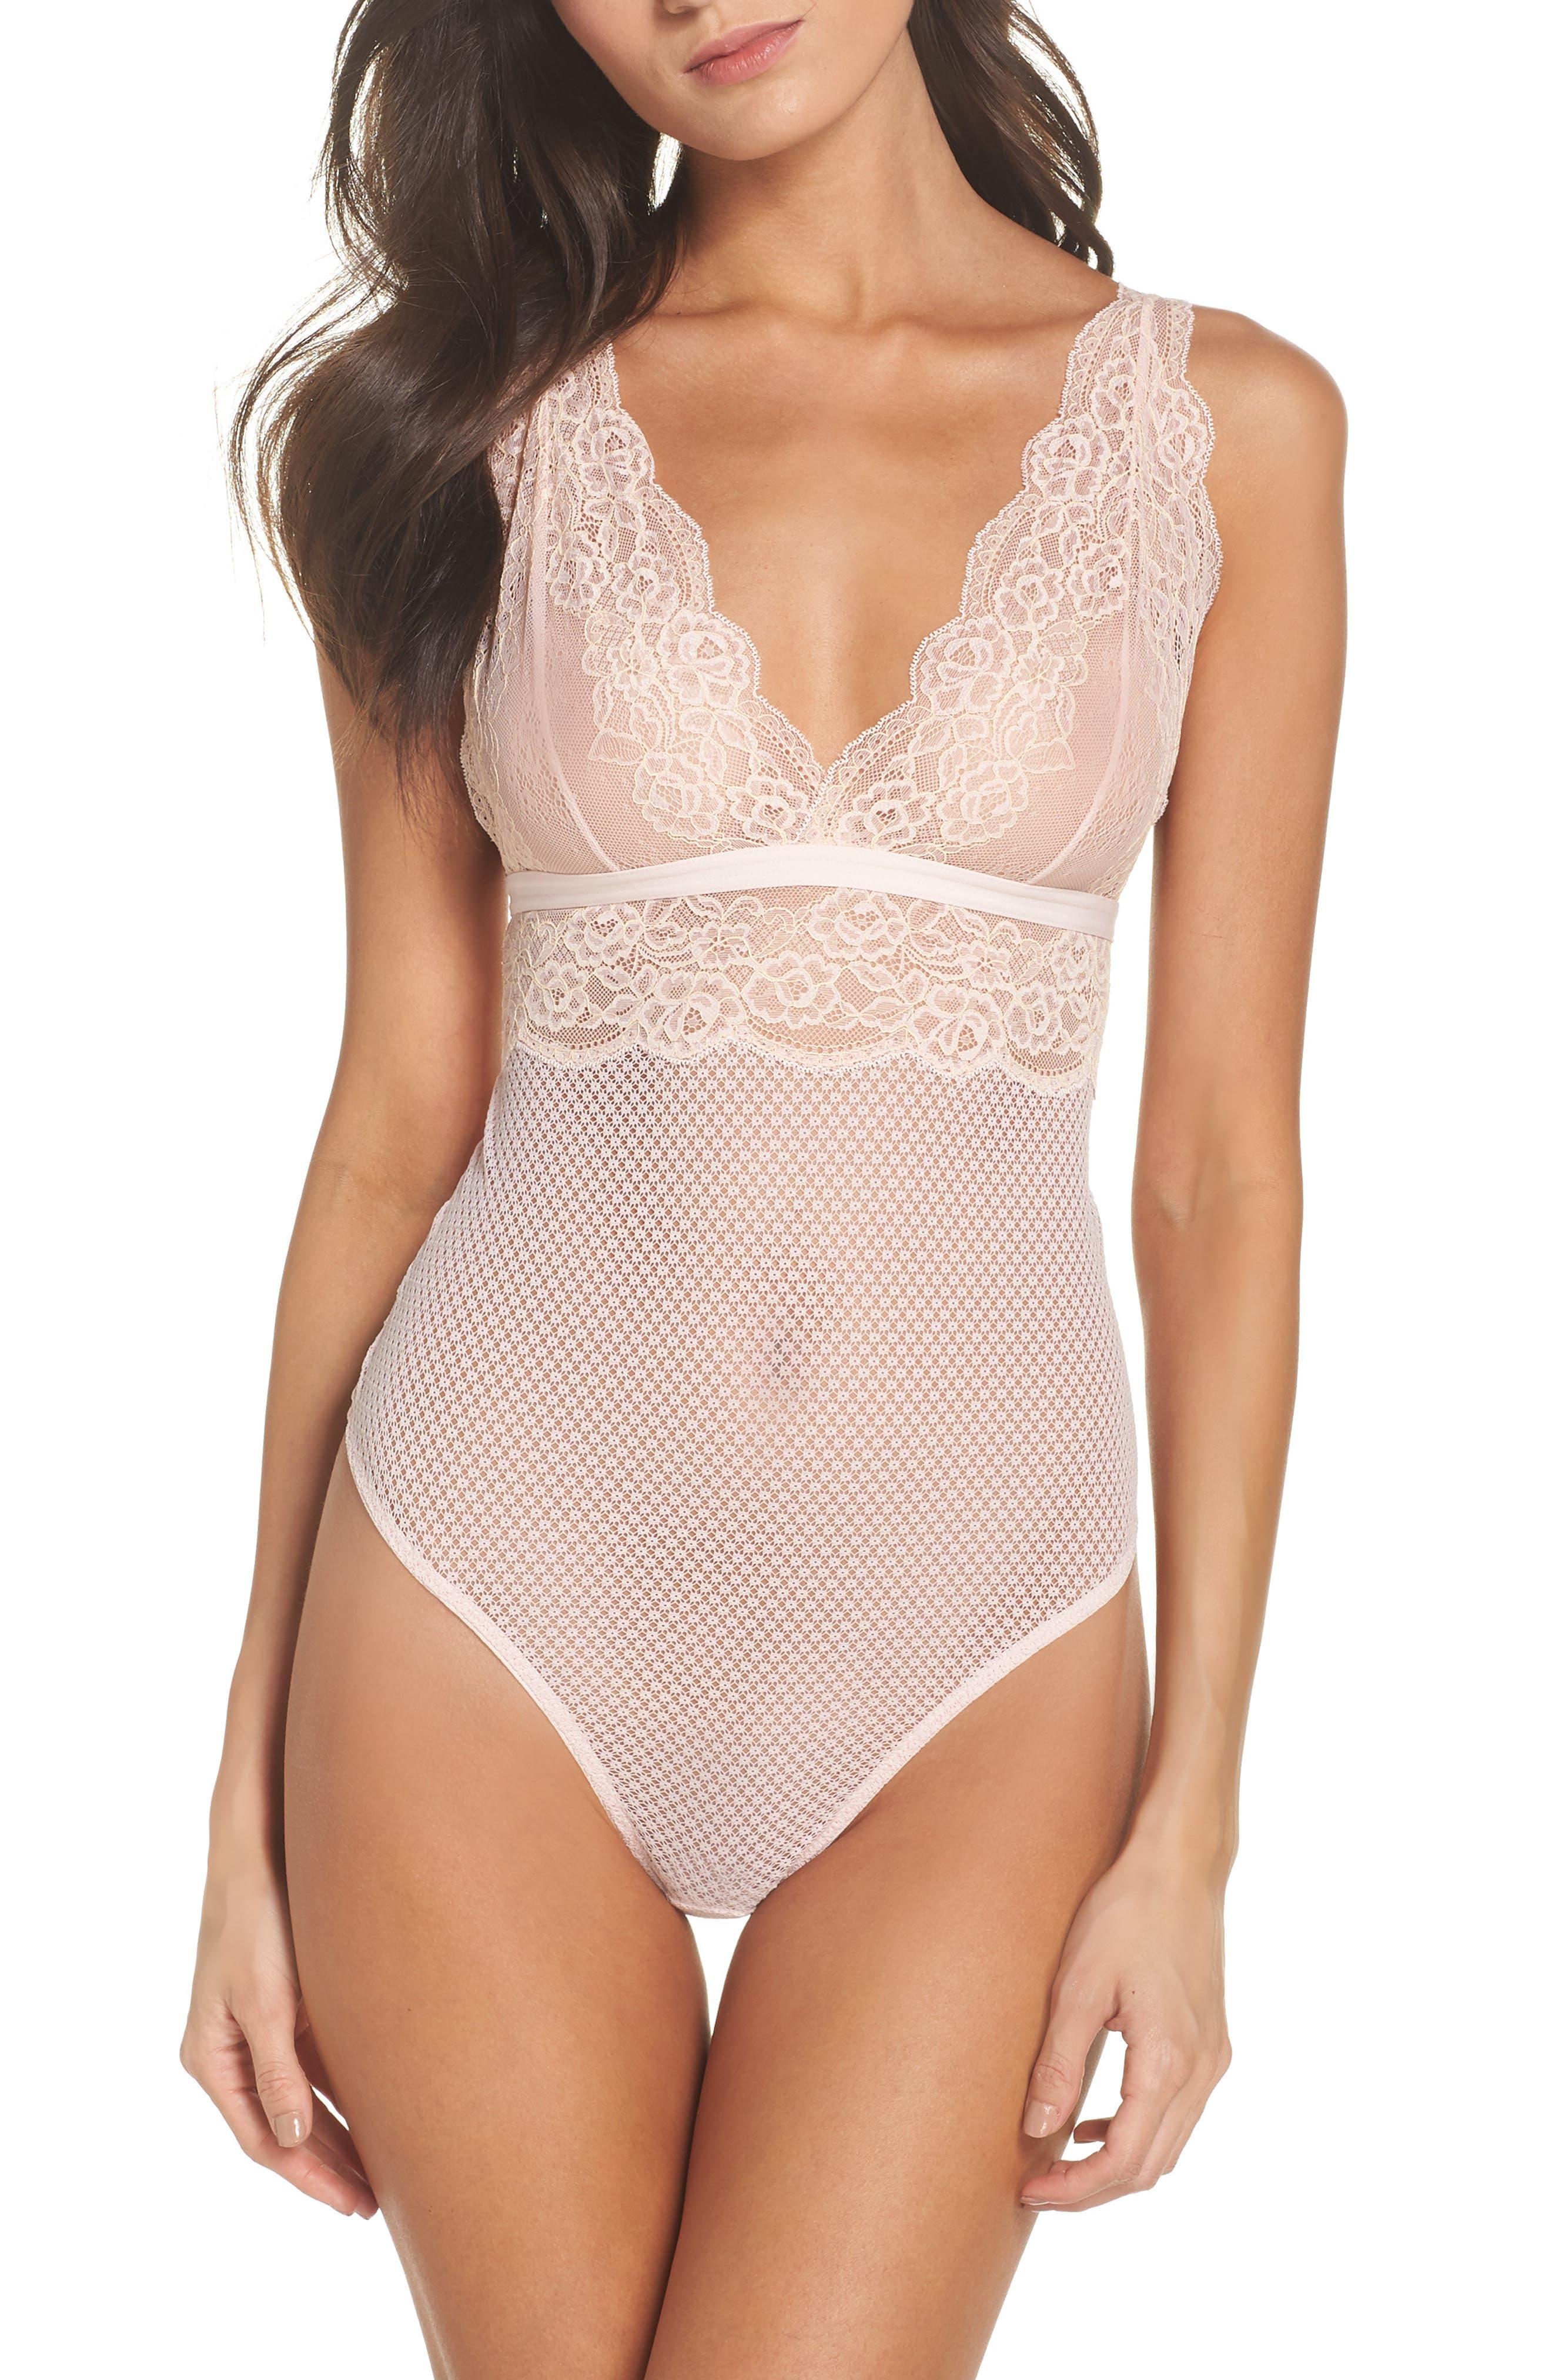 Main Image - Boux Avenue Erica Lace Thong Bodysuit